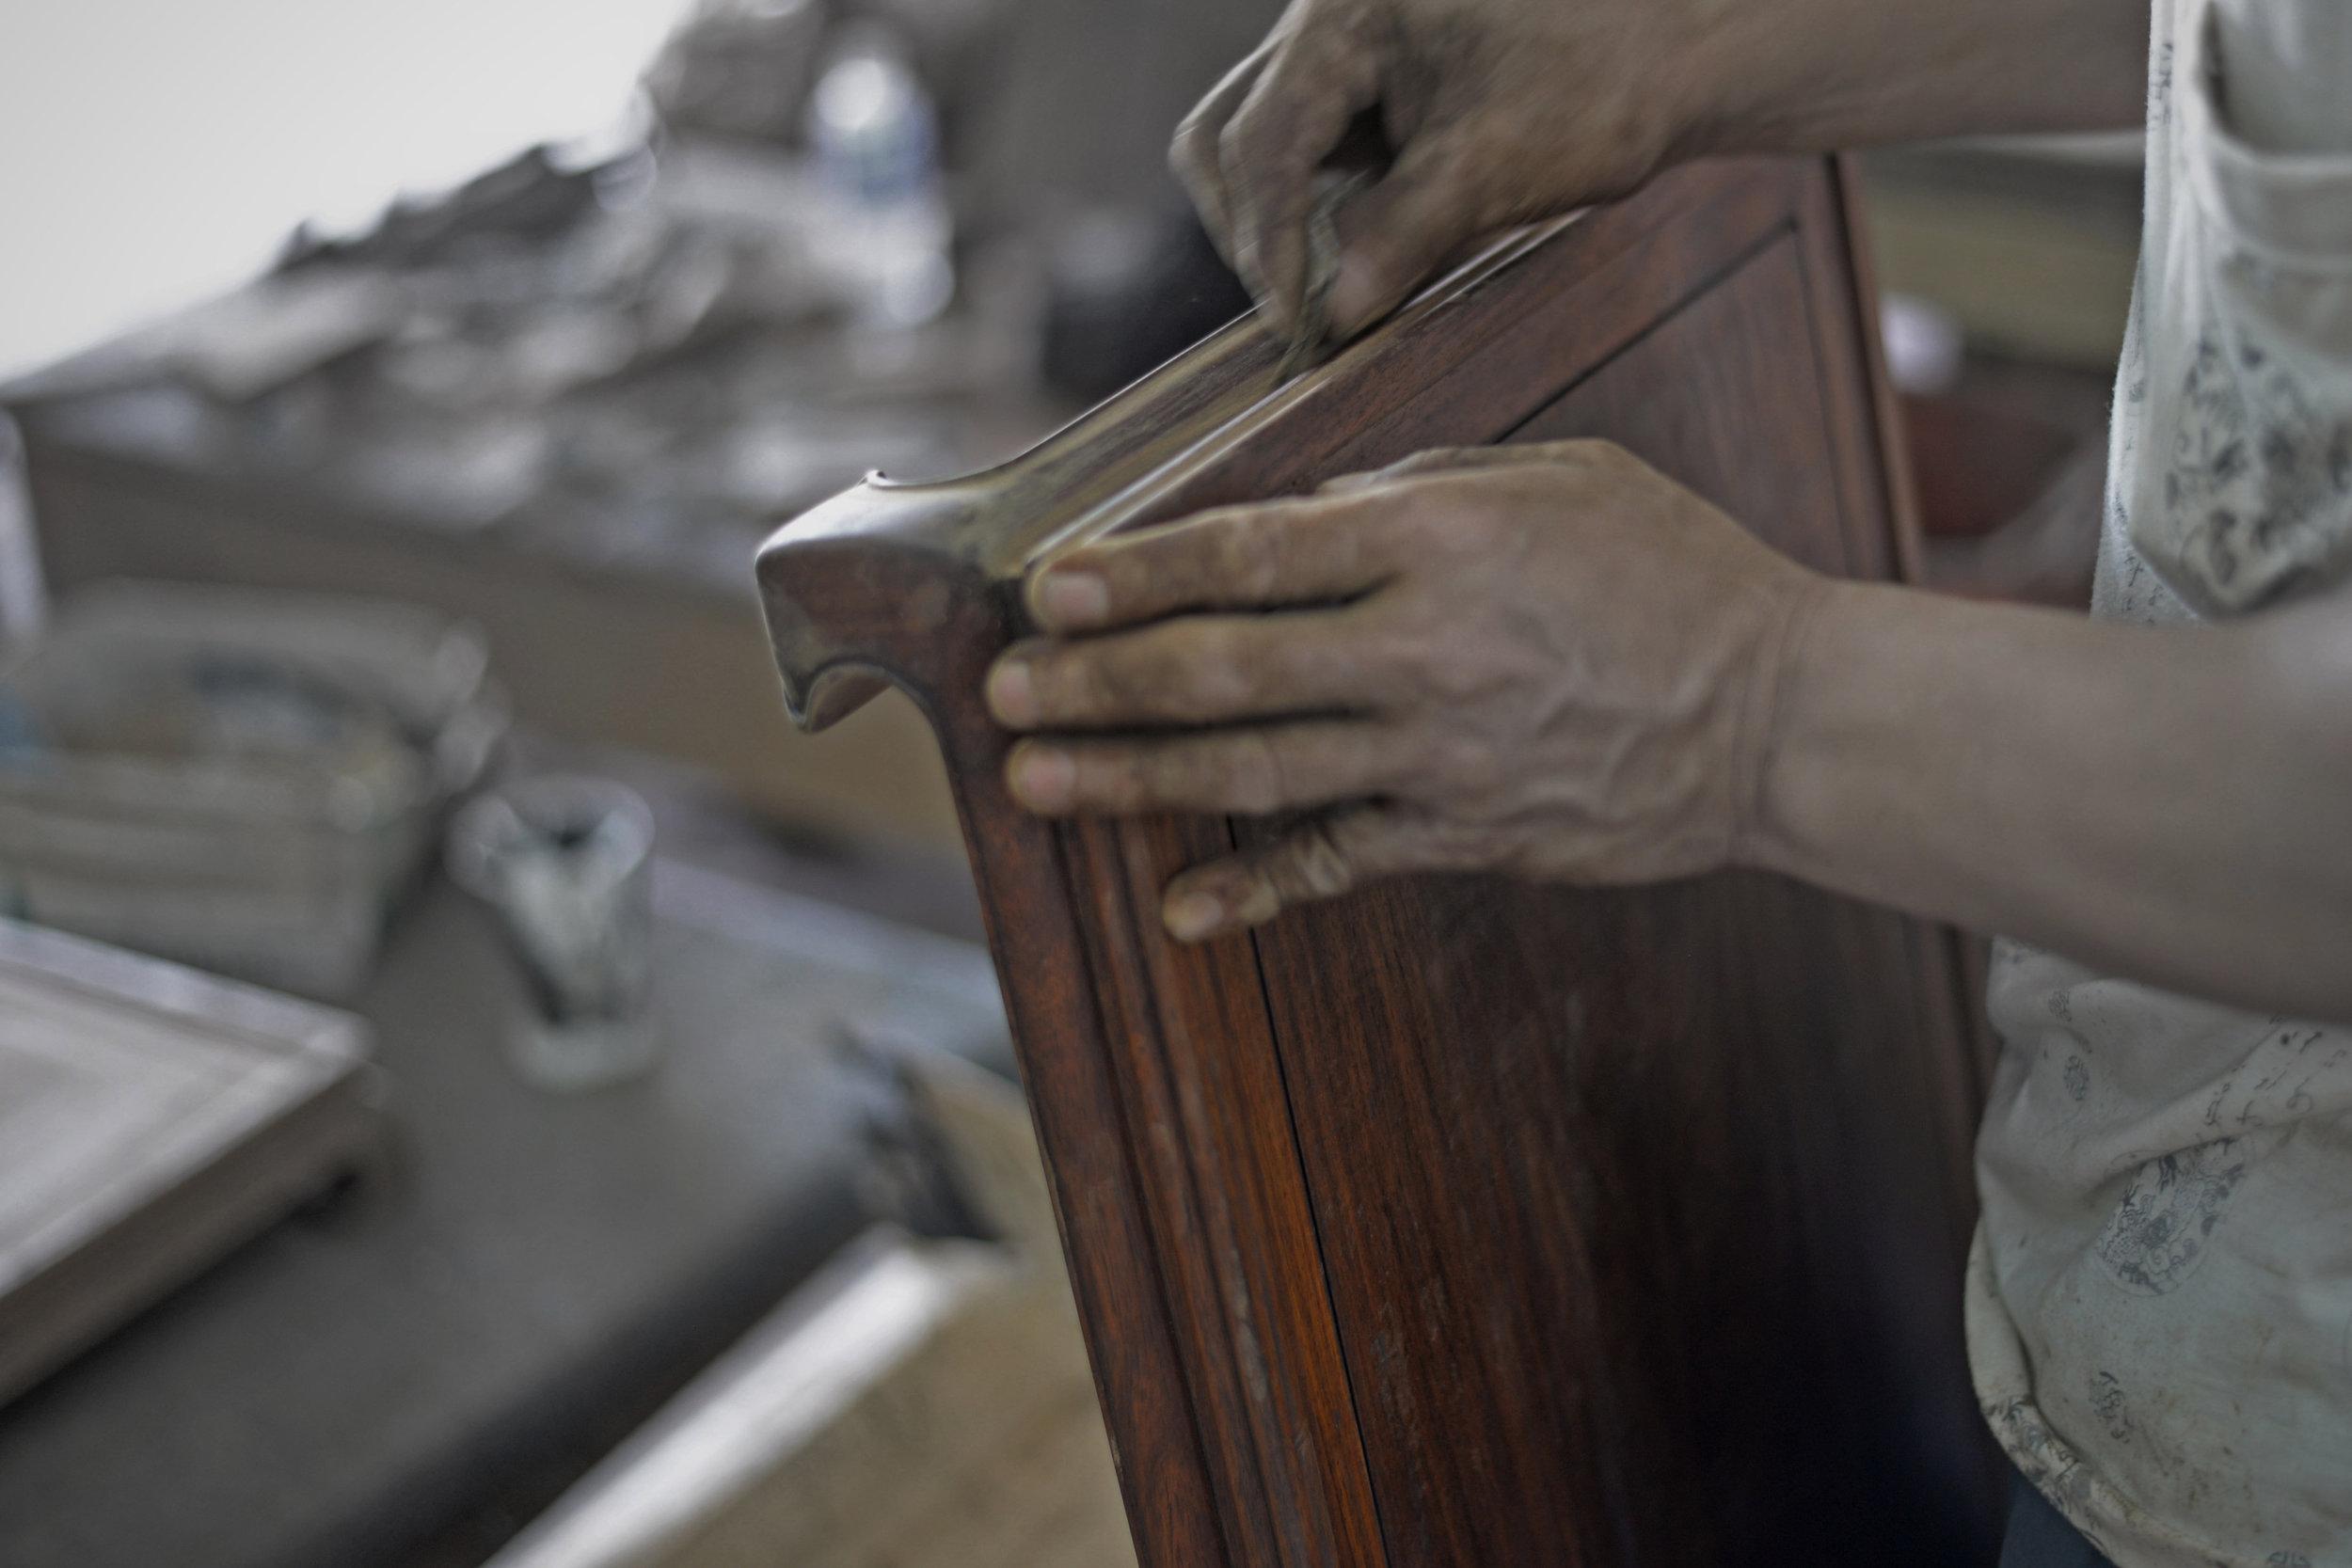 ....bespoke furniture : artisan crafting photo..特别定制家具 : 公丈制作照片....